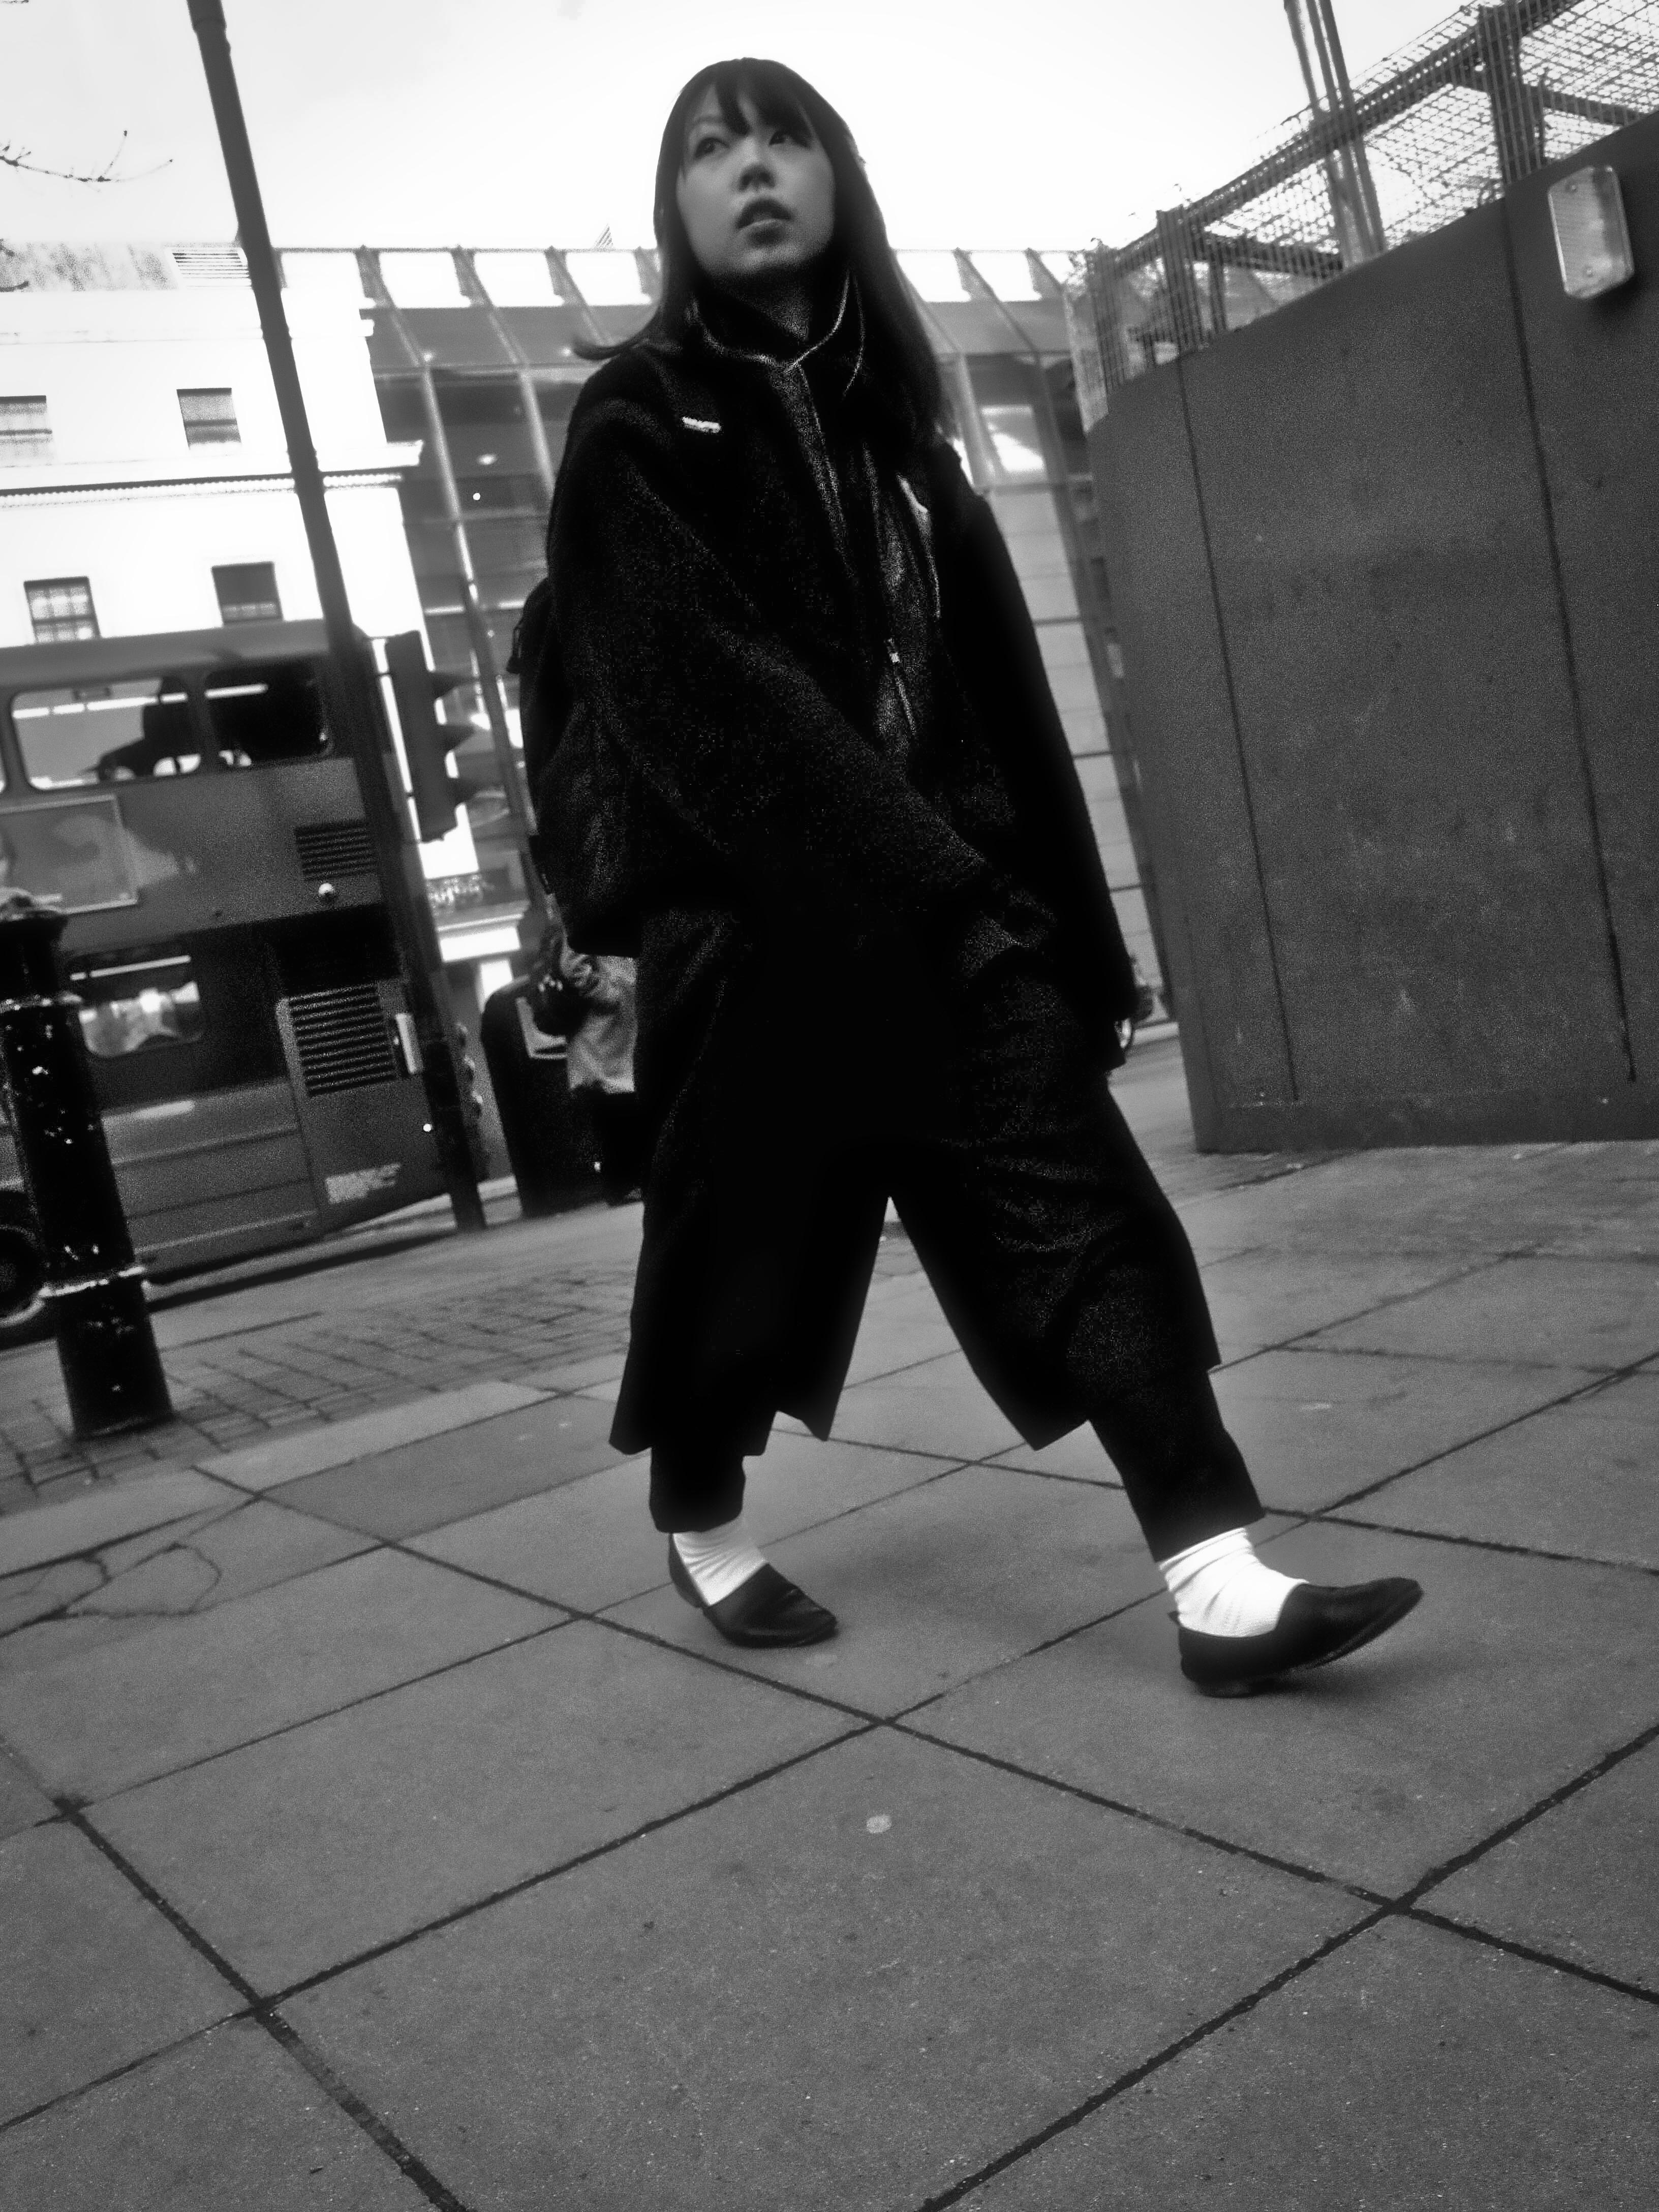 West End, London, January 2017